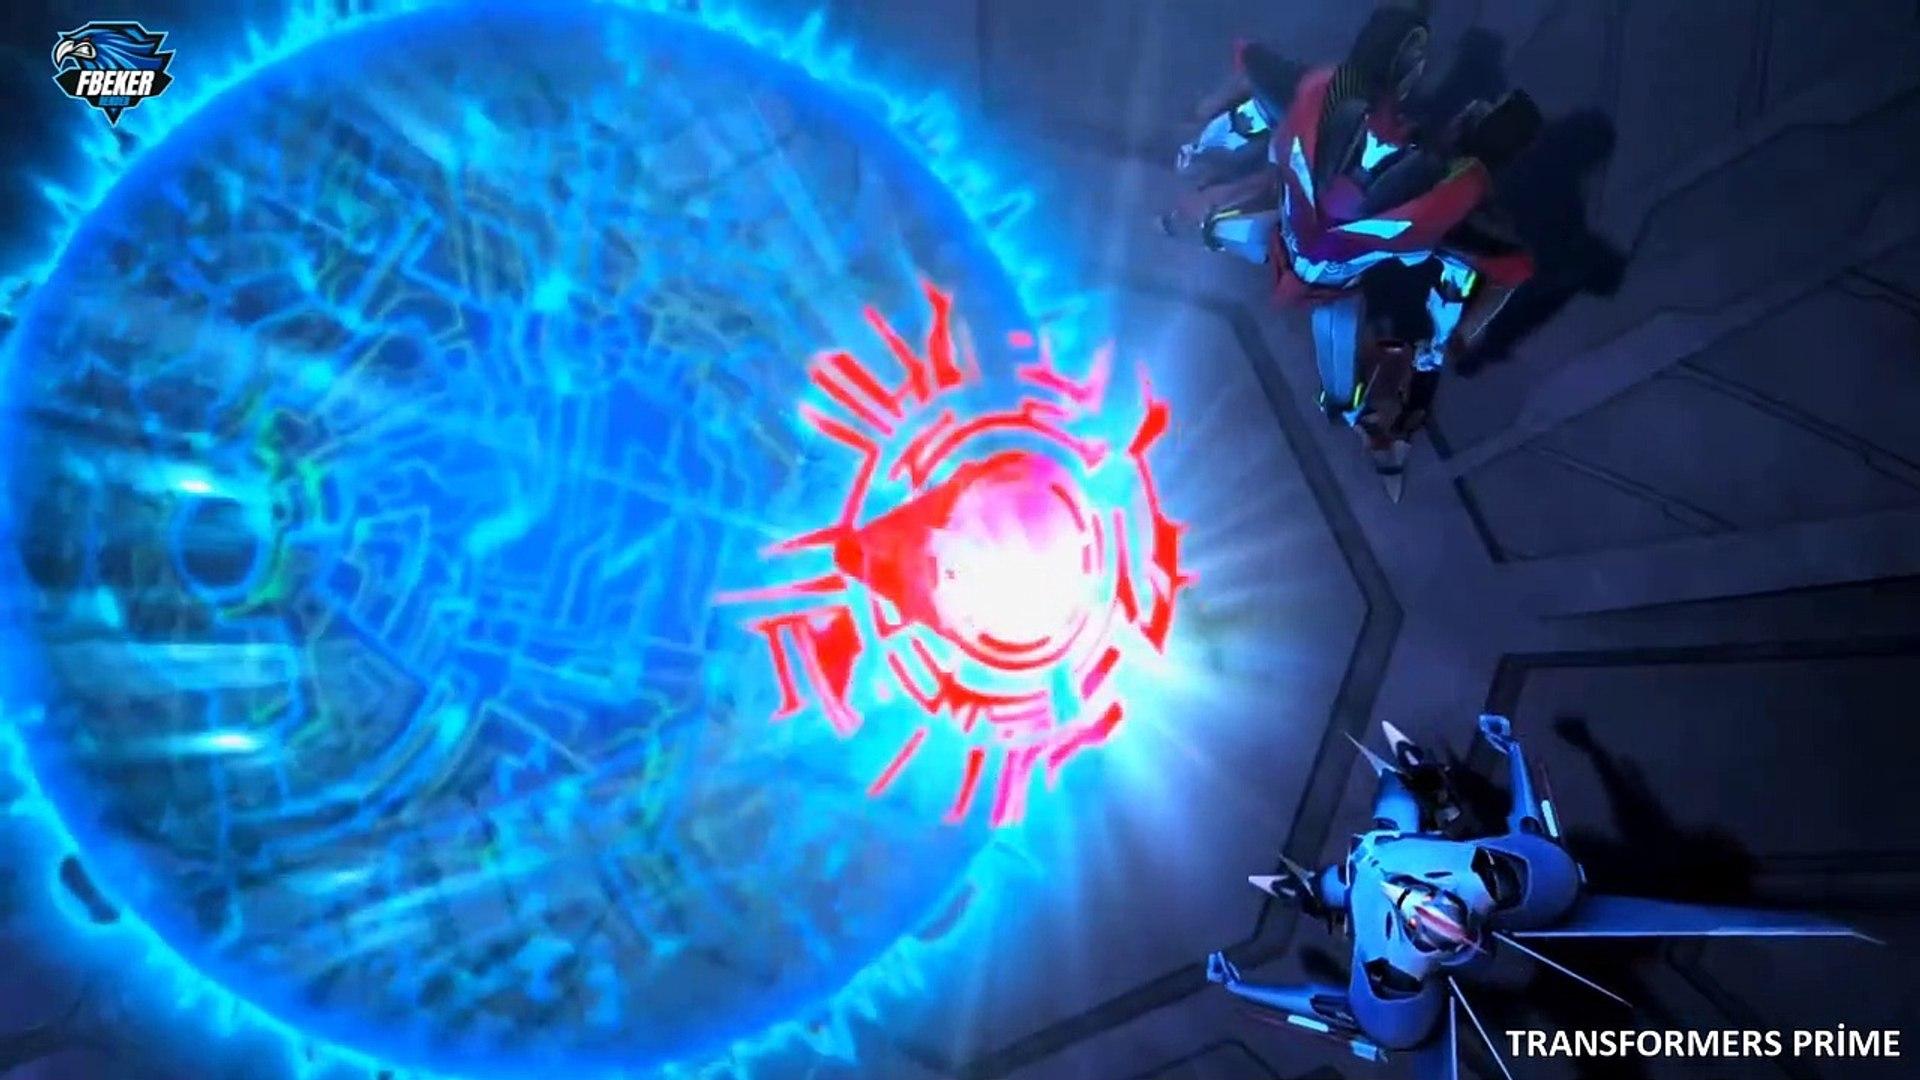 Transformers Prime 51.Bölüm Rejenerasyon Full Hd